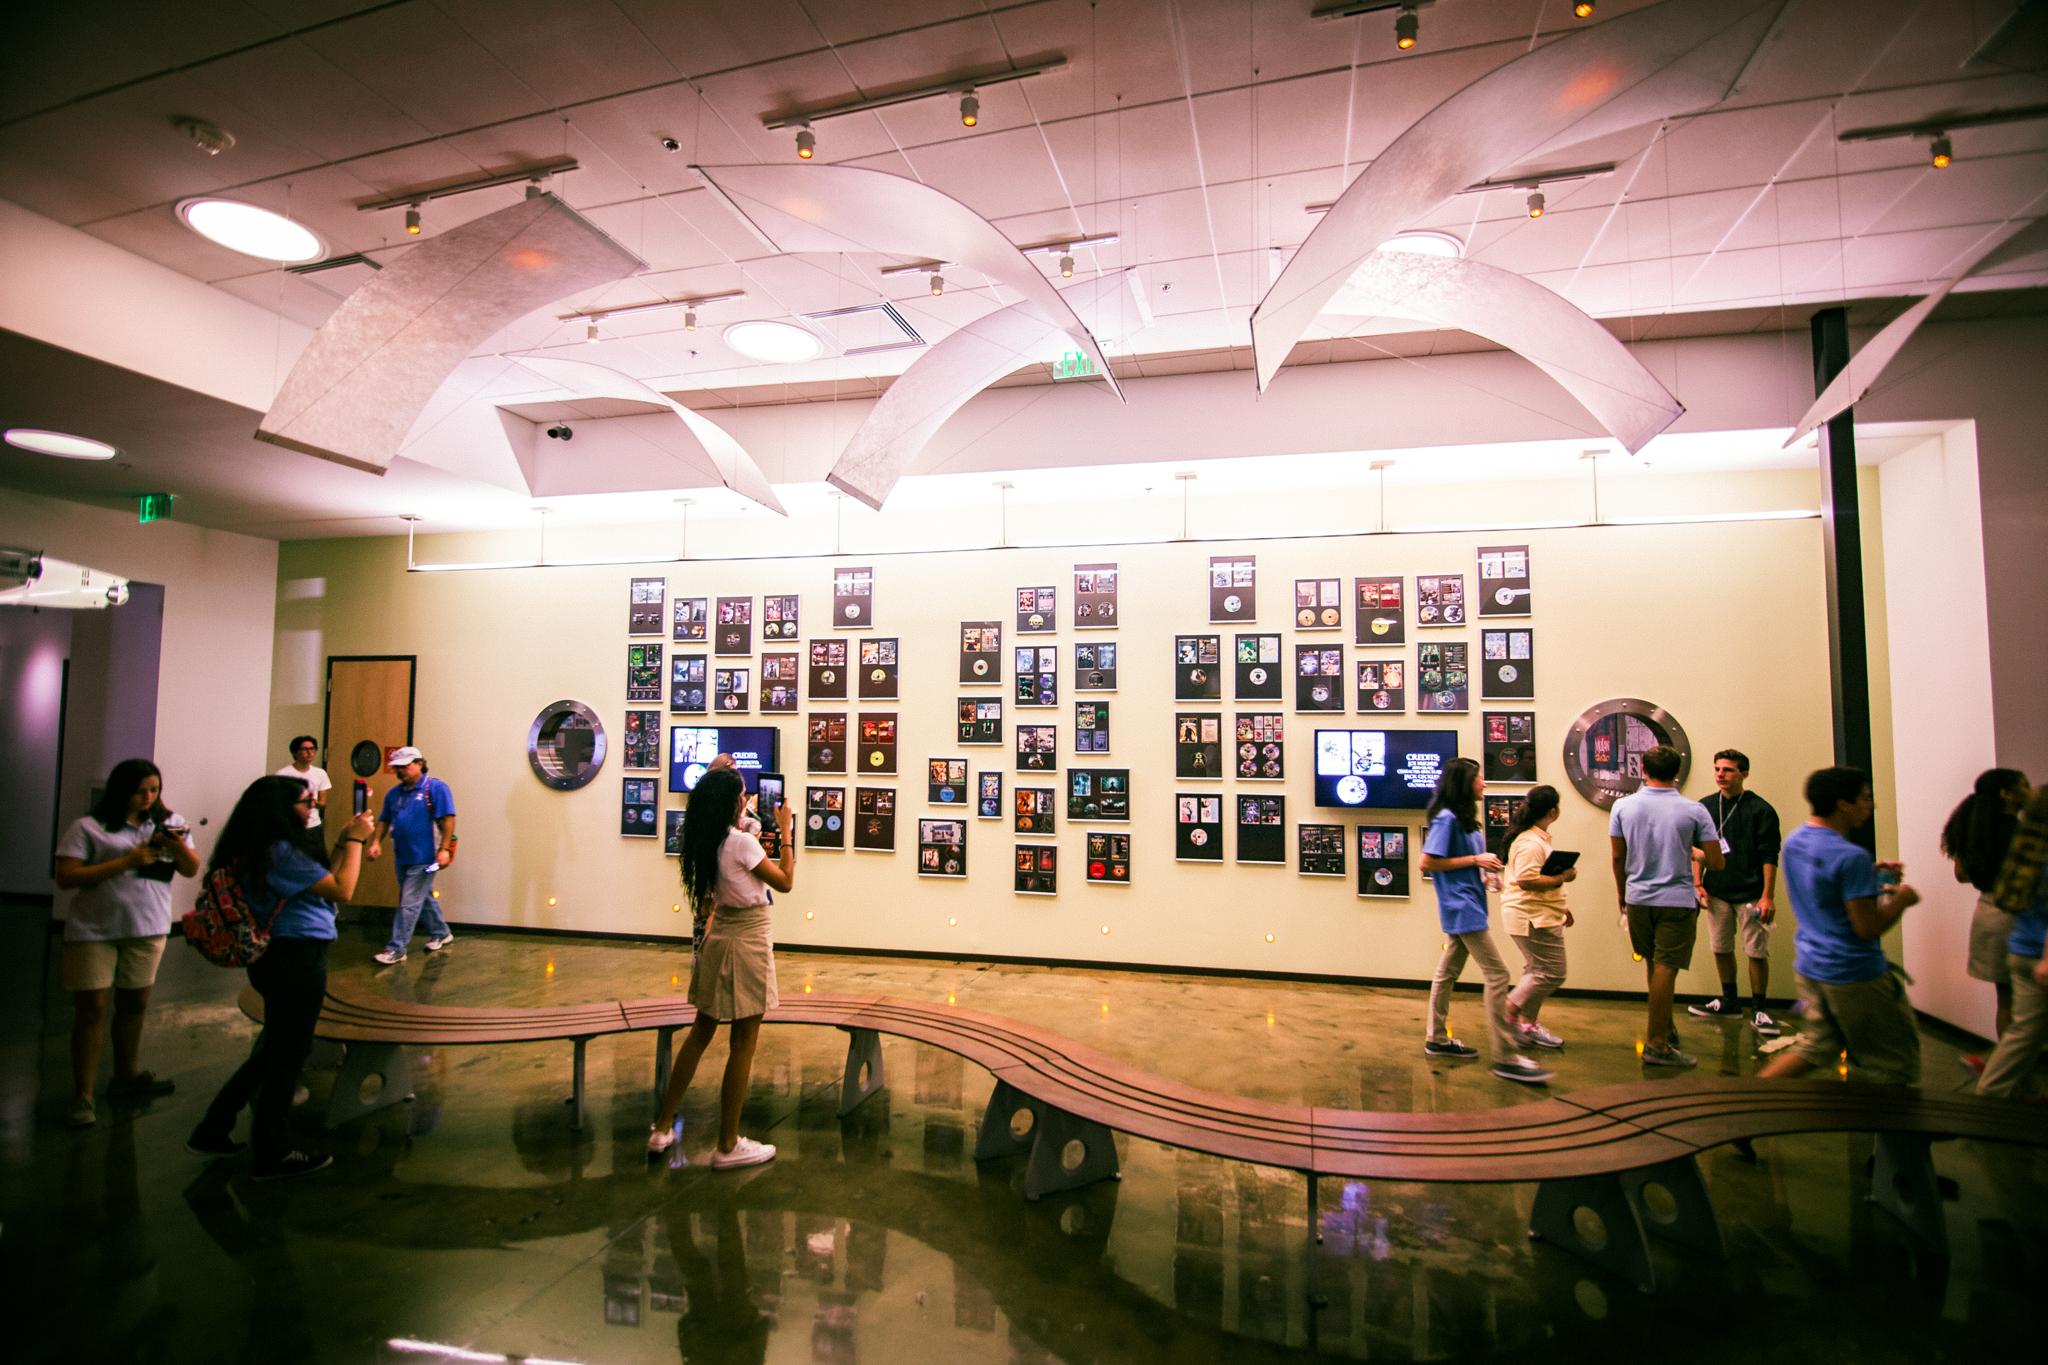 FS_LABS_One_School_of_the_Arts_Aug.25_04.jpg